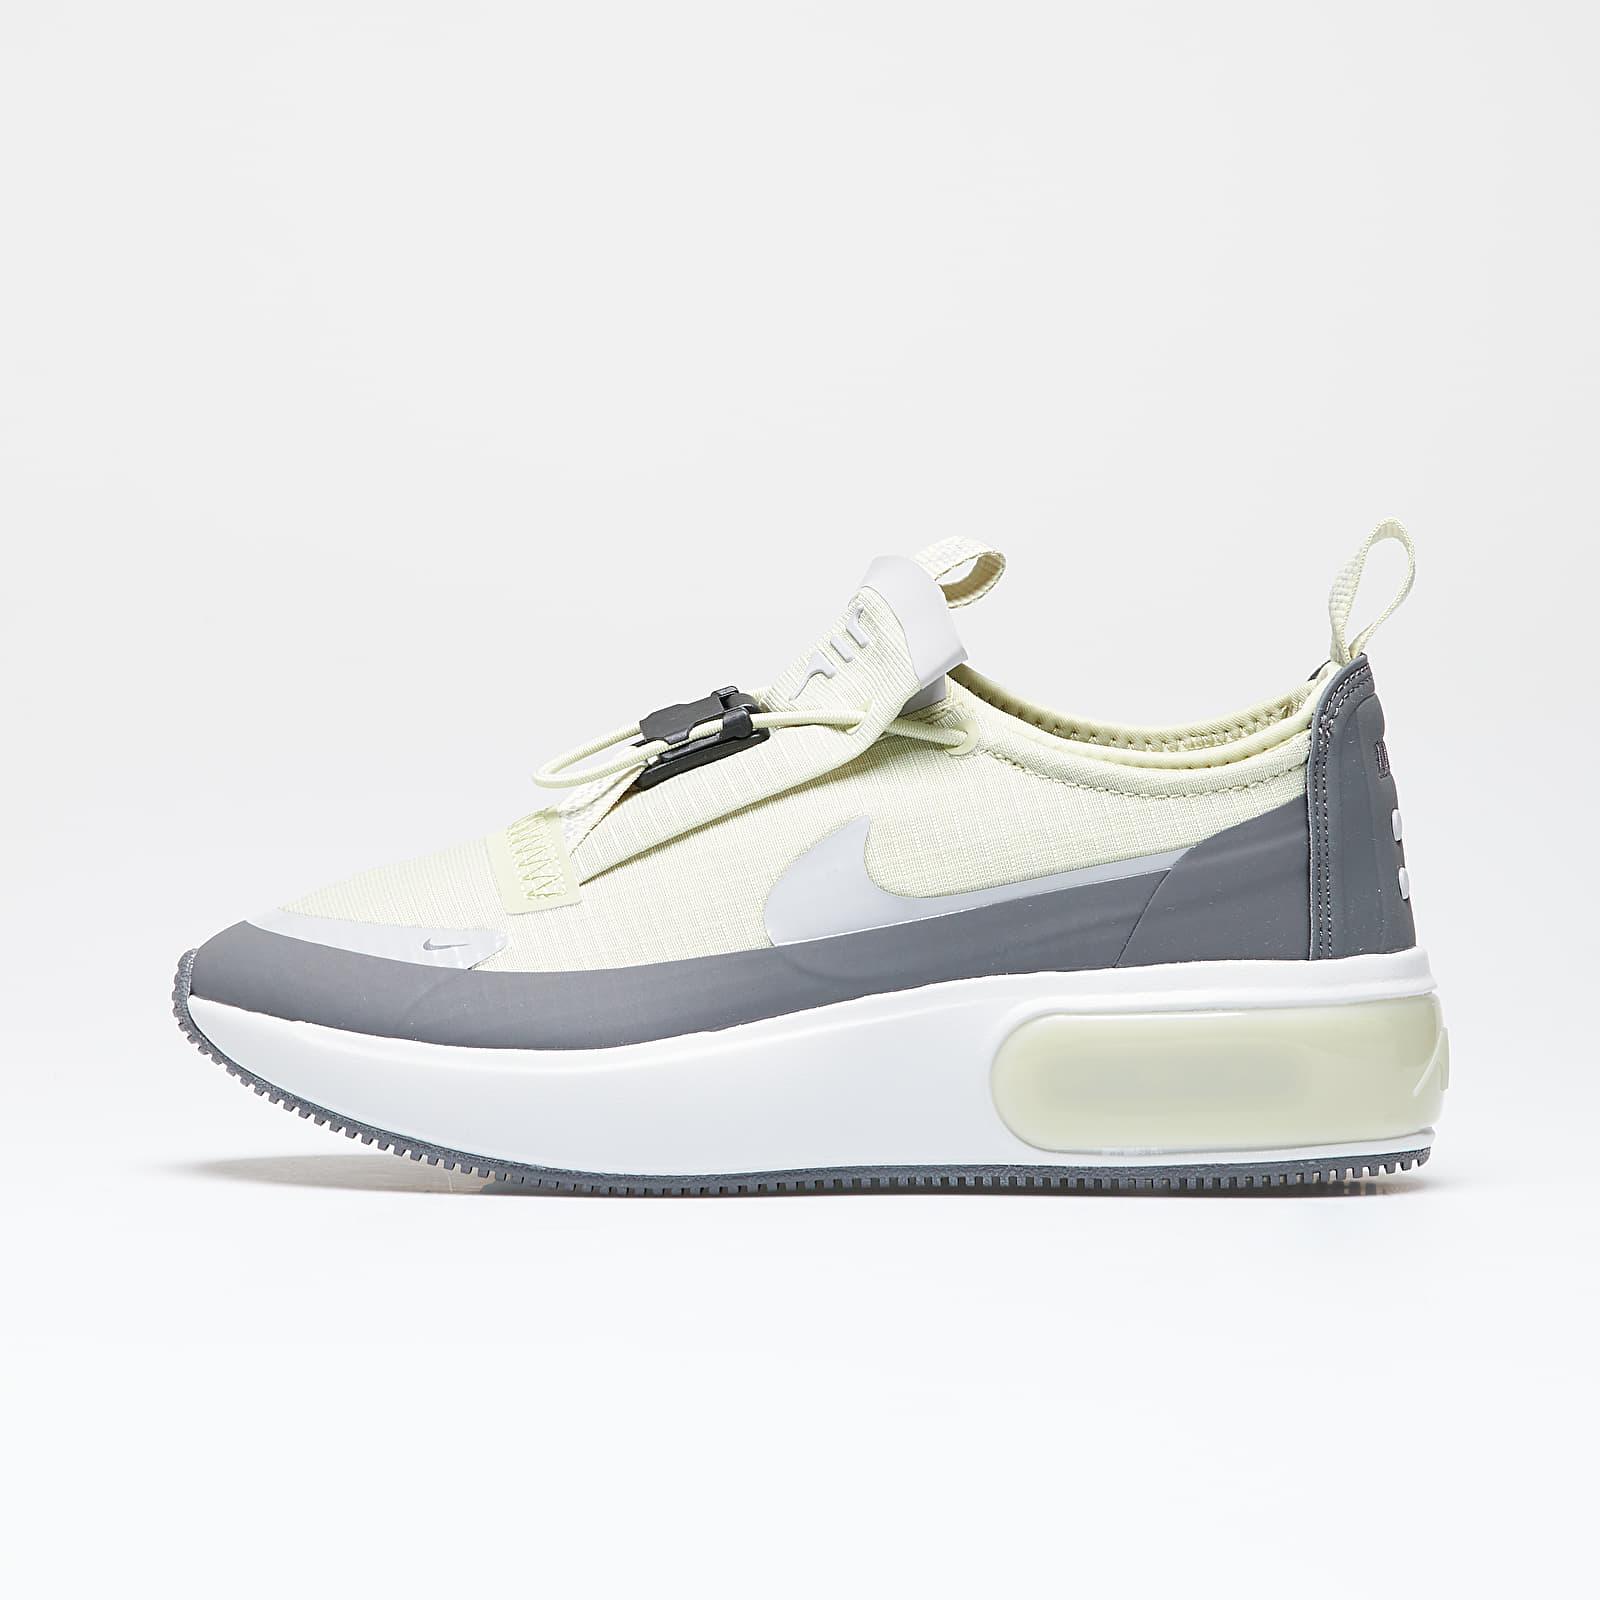 Women's shoes Nike W Air Max Dia Winter Olive Aura/ Lt Smoke Grey-Iron Grey